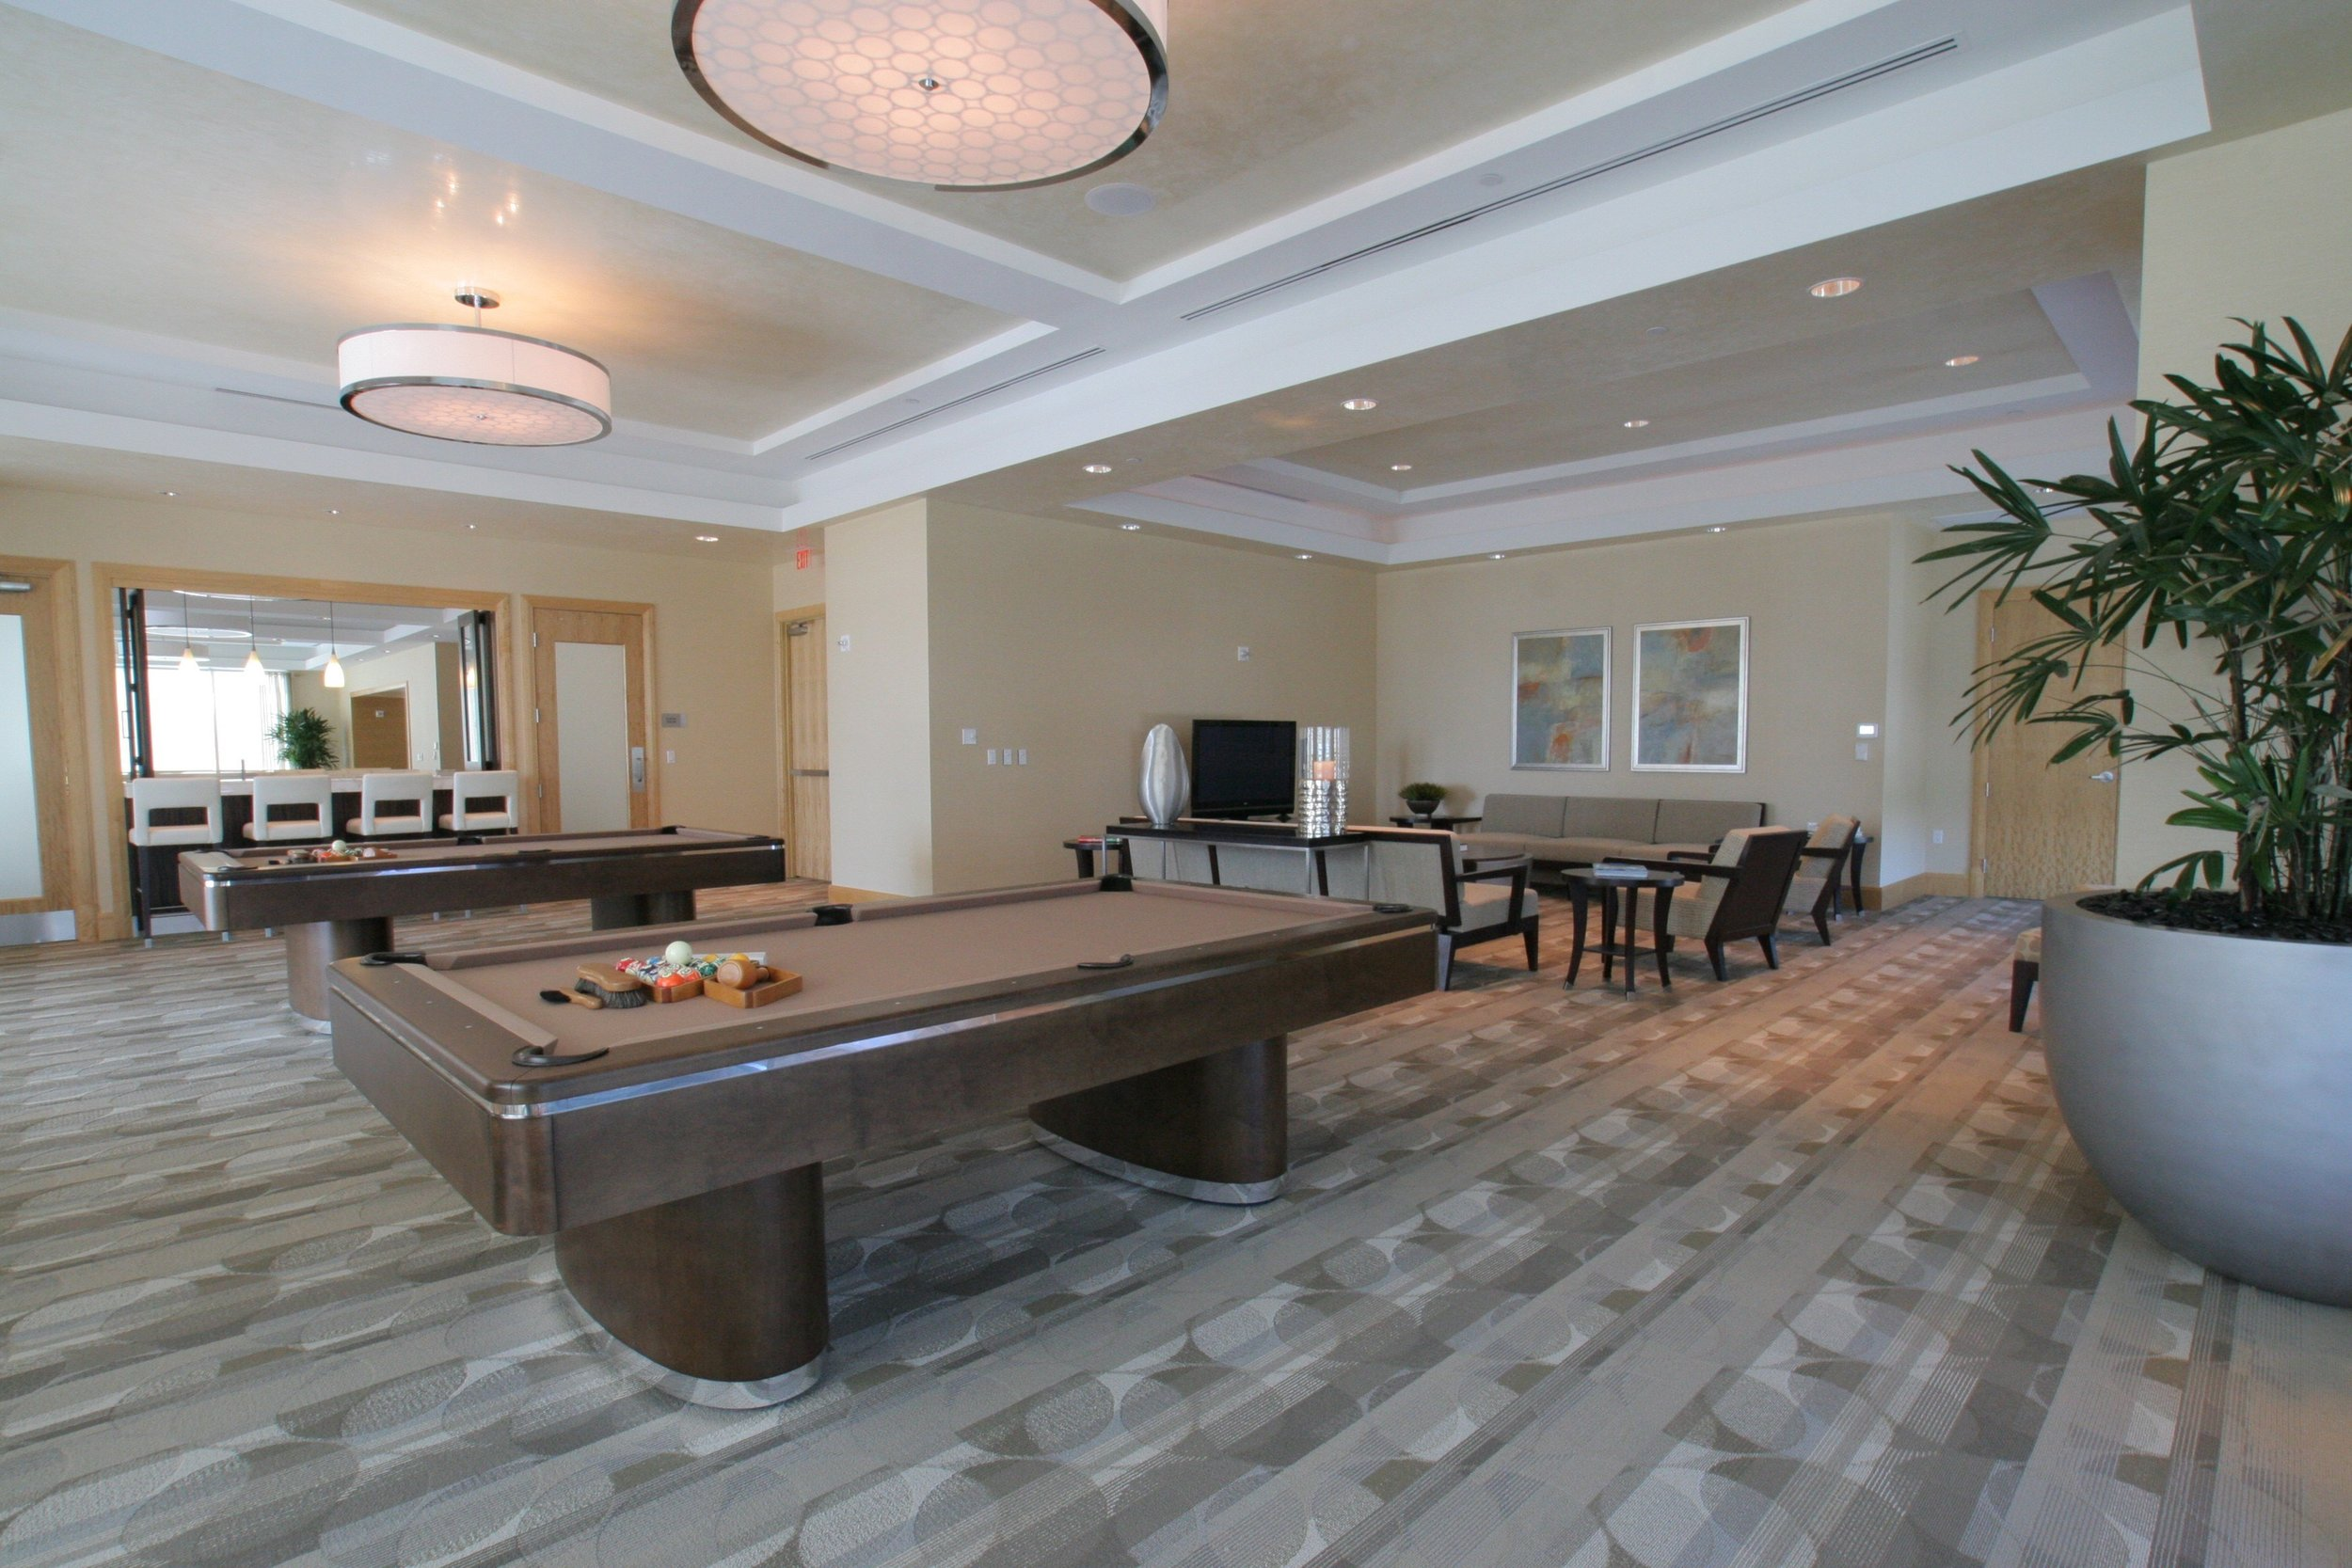 033_Billiards Room.jpg